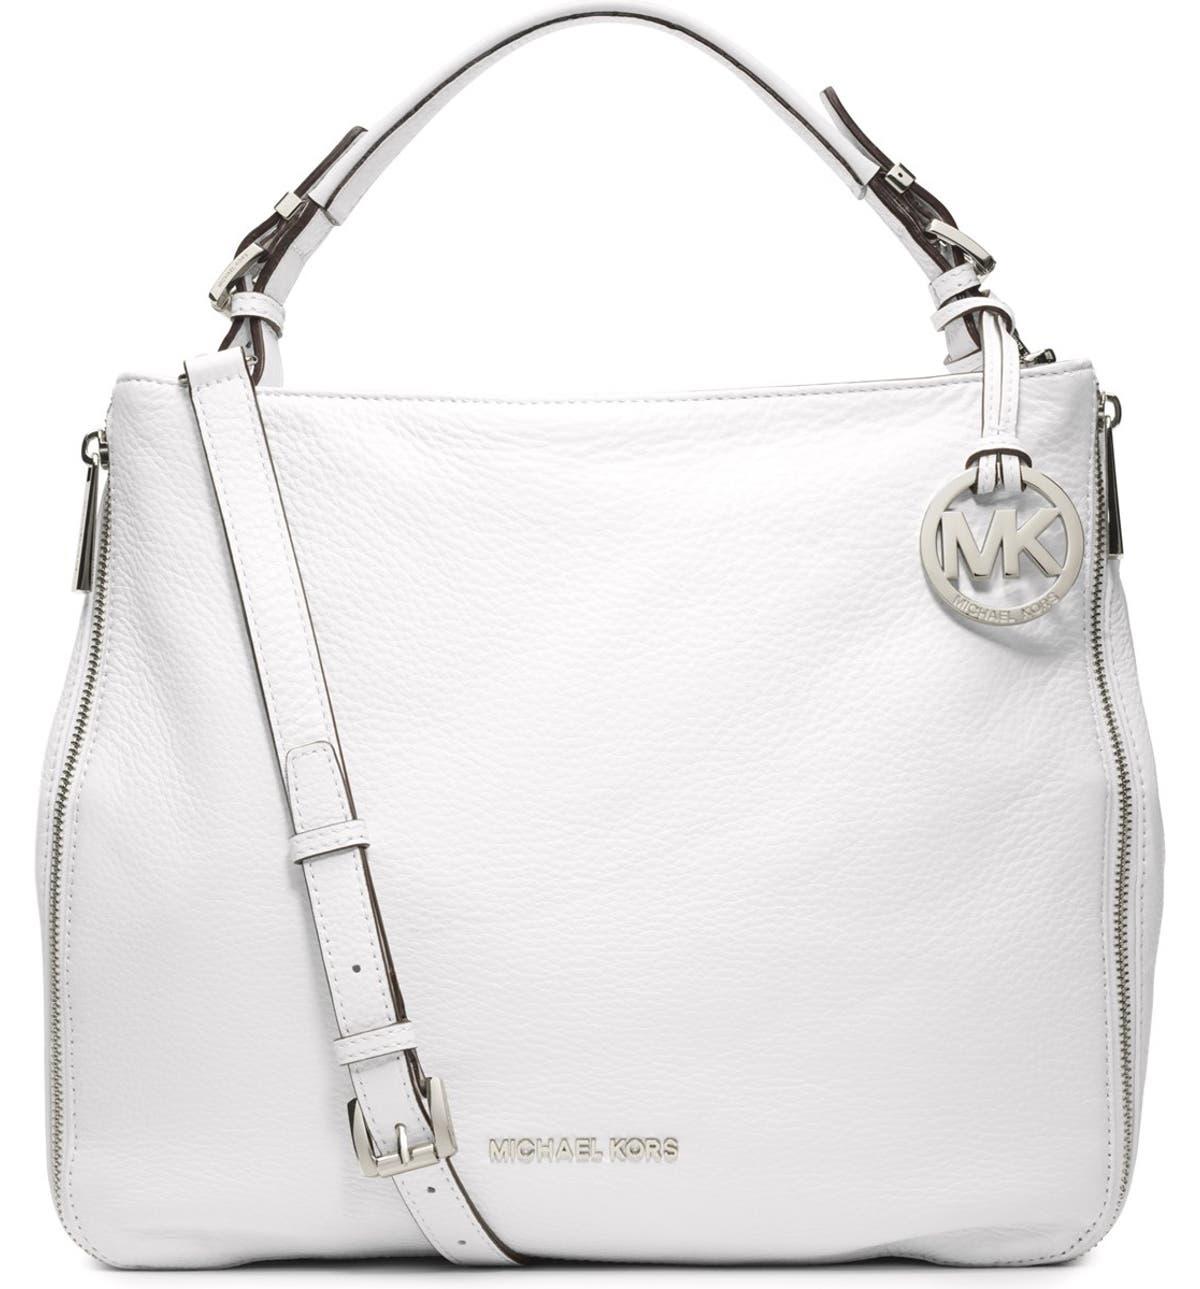 25a5090c88a17a MICHAEL Michael Kors 'Large Essex' Shoulder Bag | Nordstrom